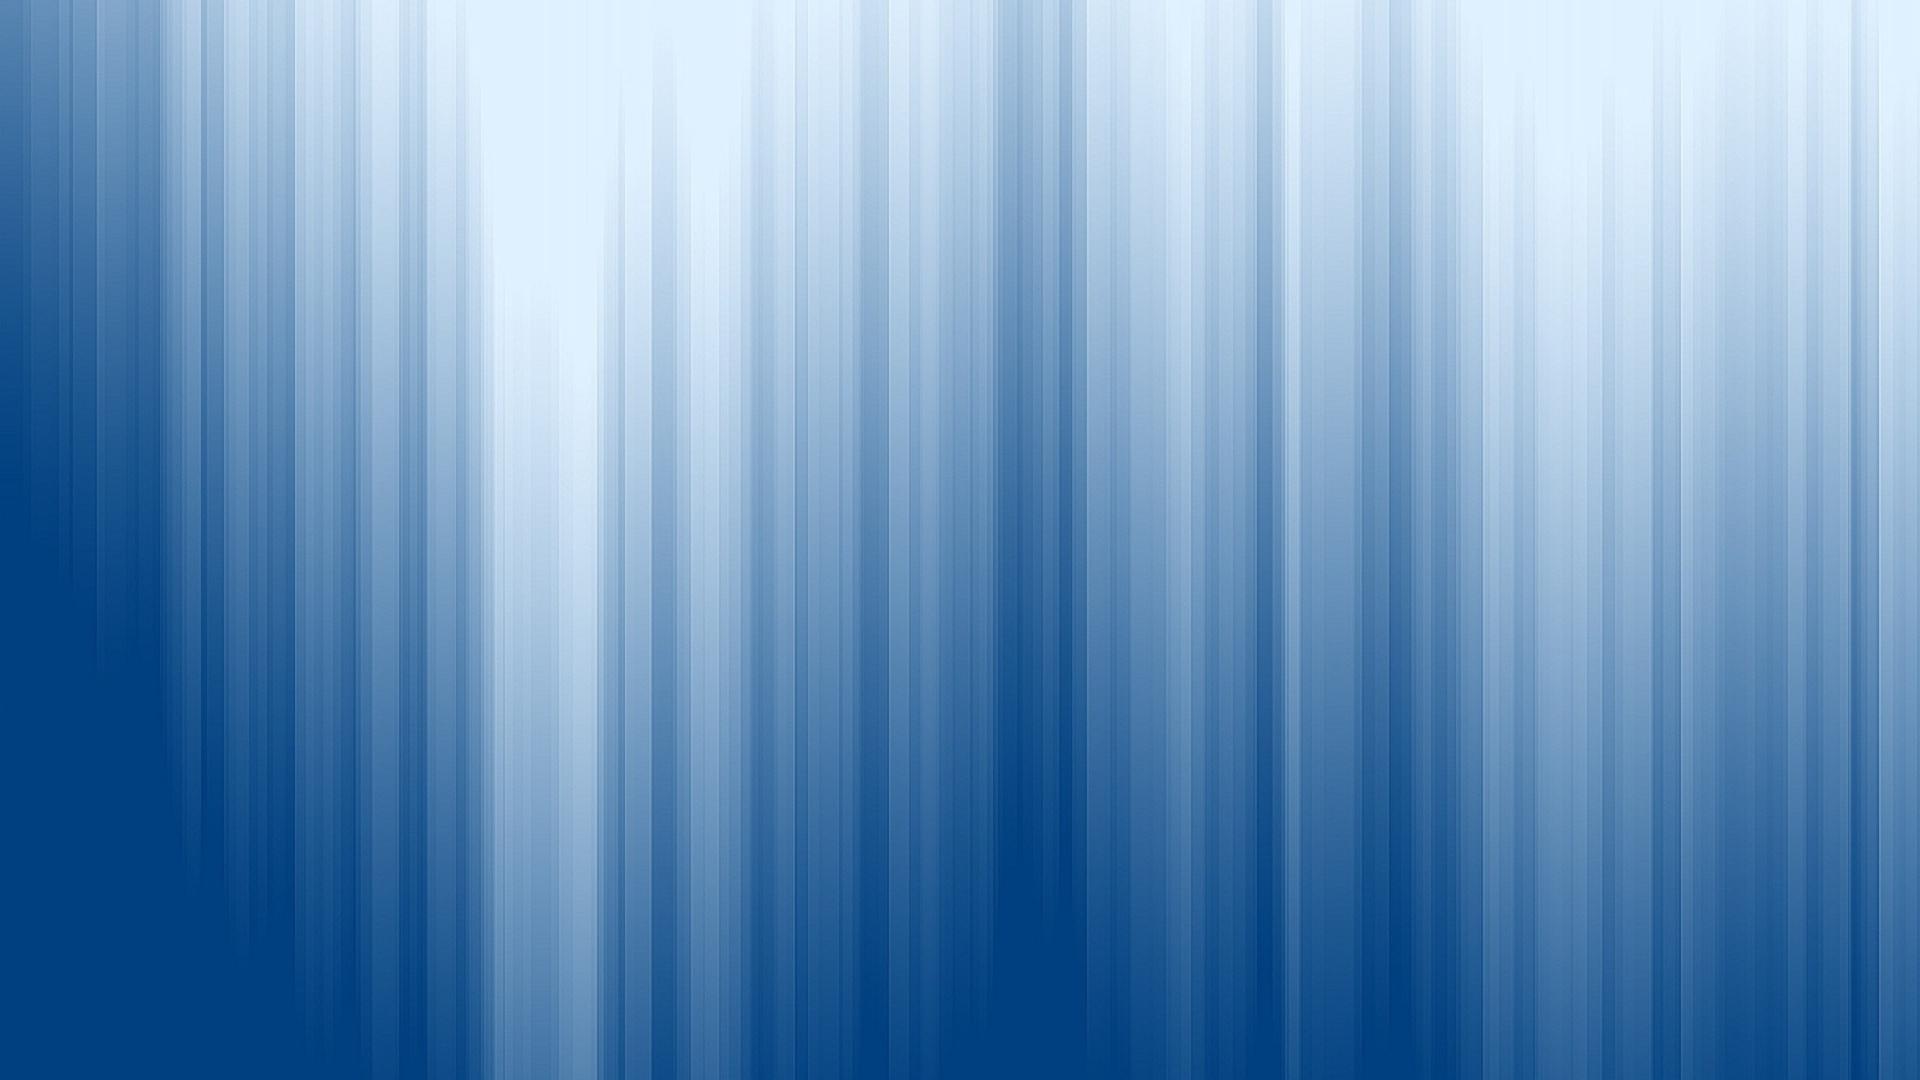 Line Texture Background : Download wallpaper line texture minimalism